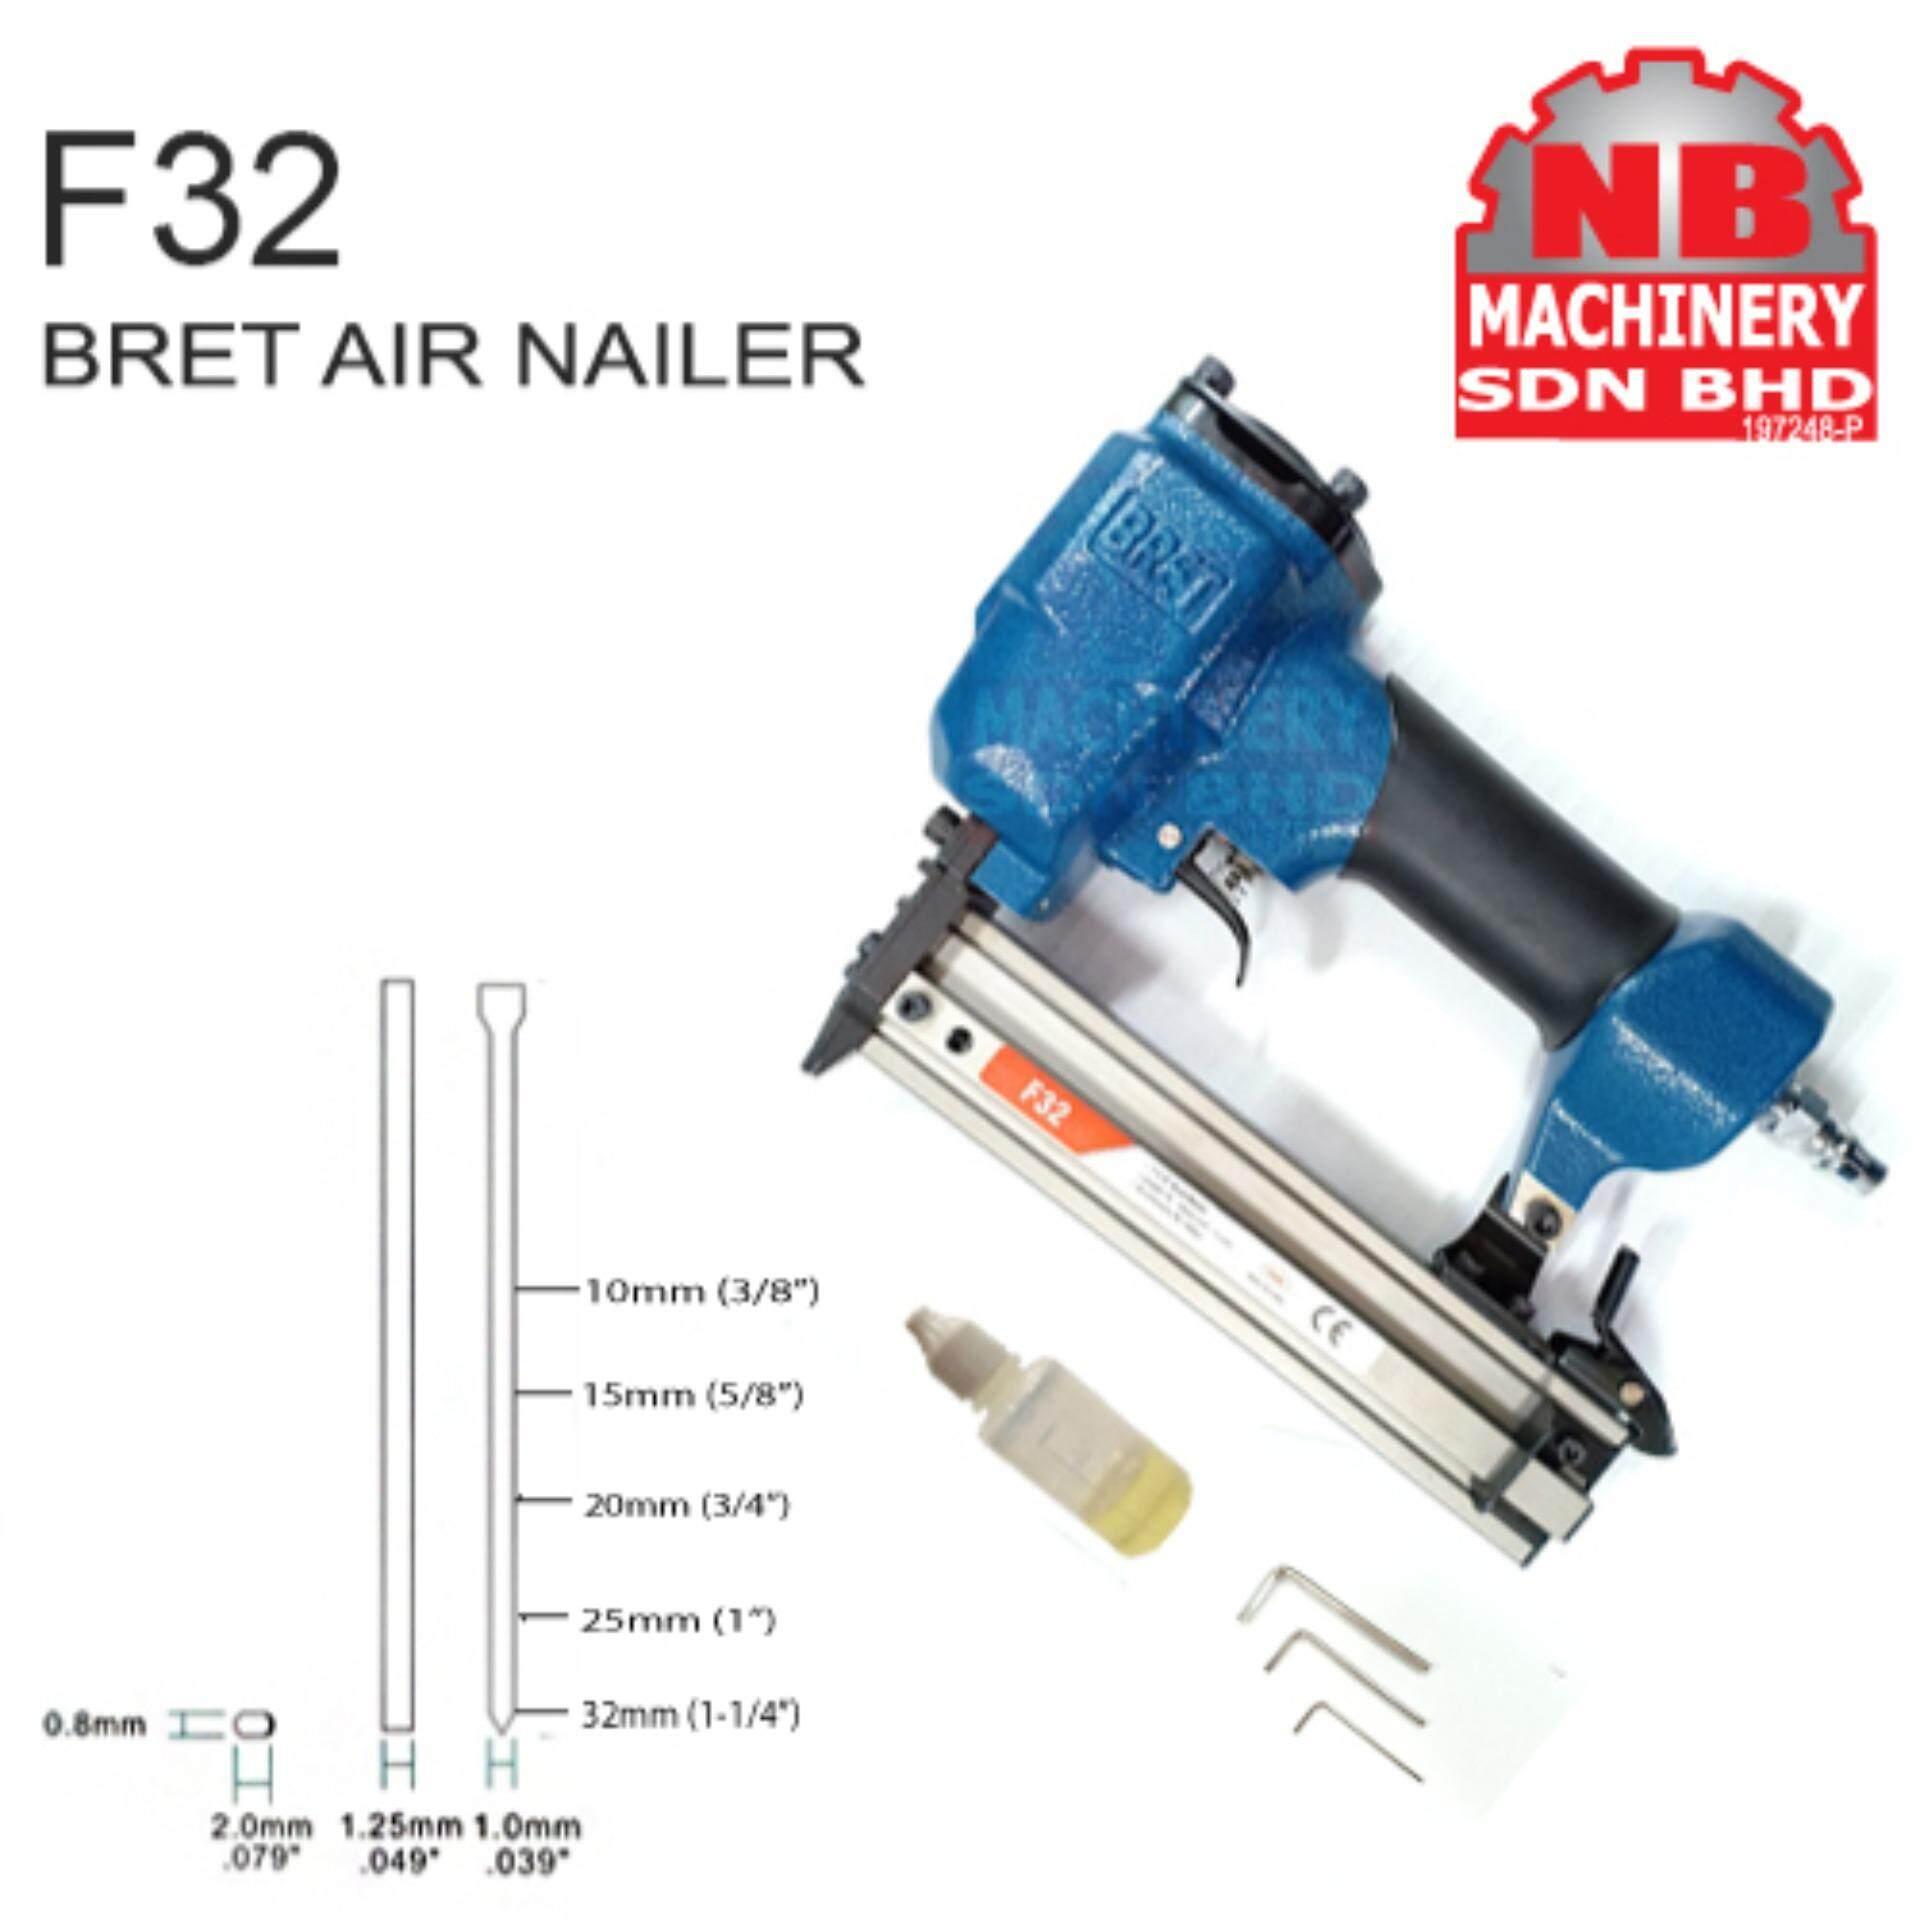 BRET AIR NAILER F-32 (Taiwan)